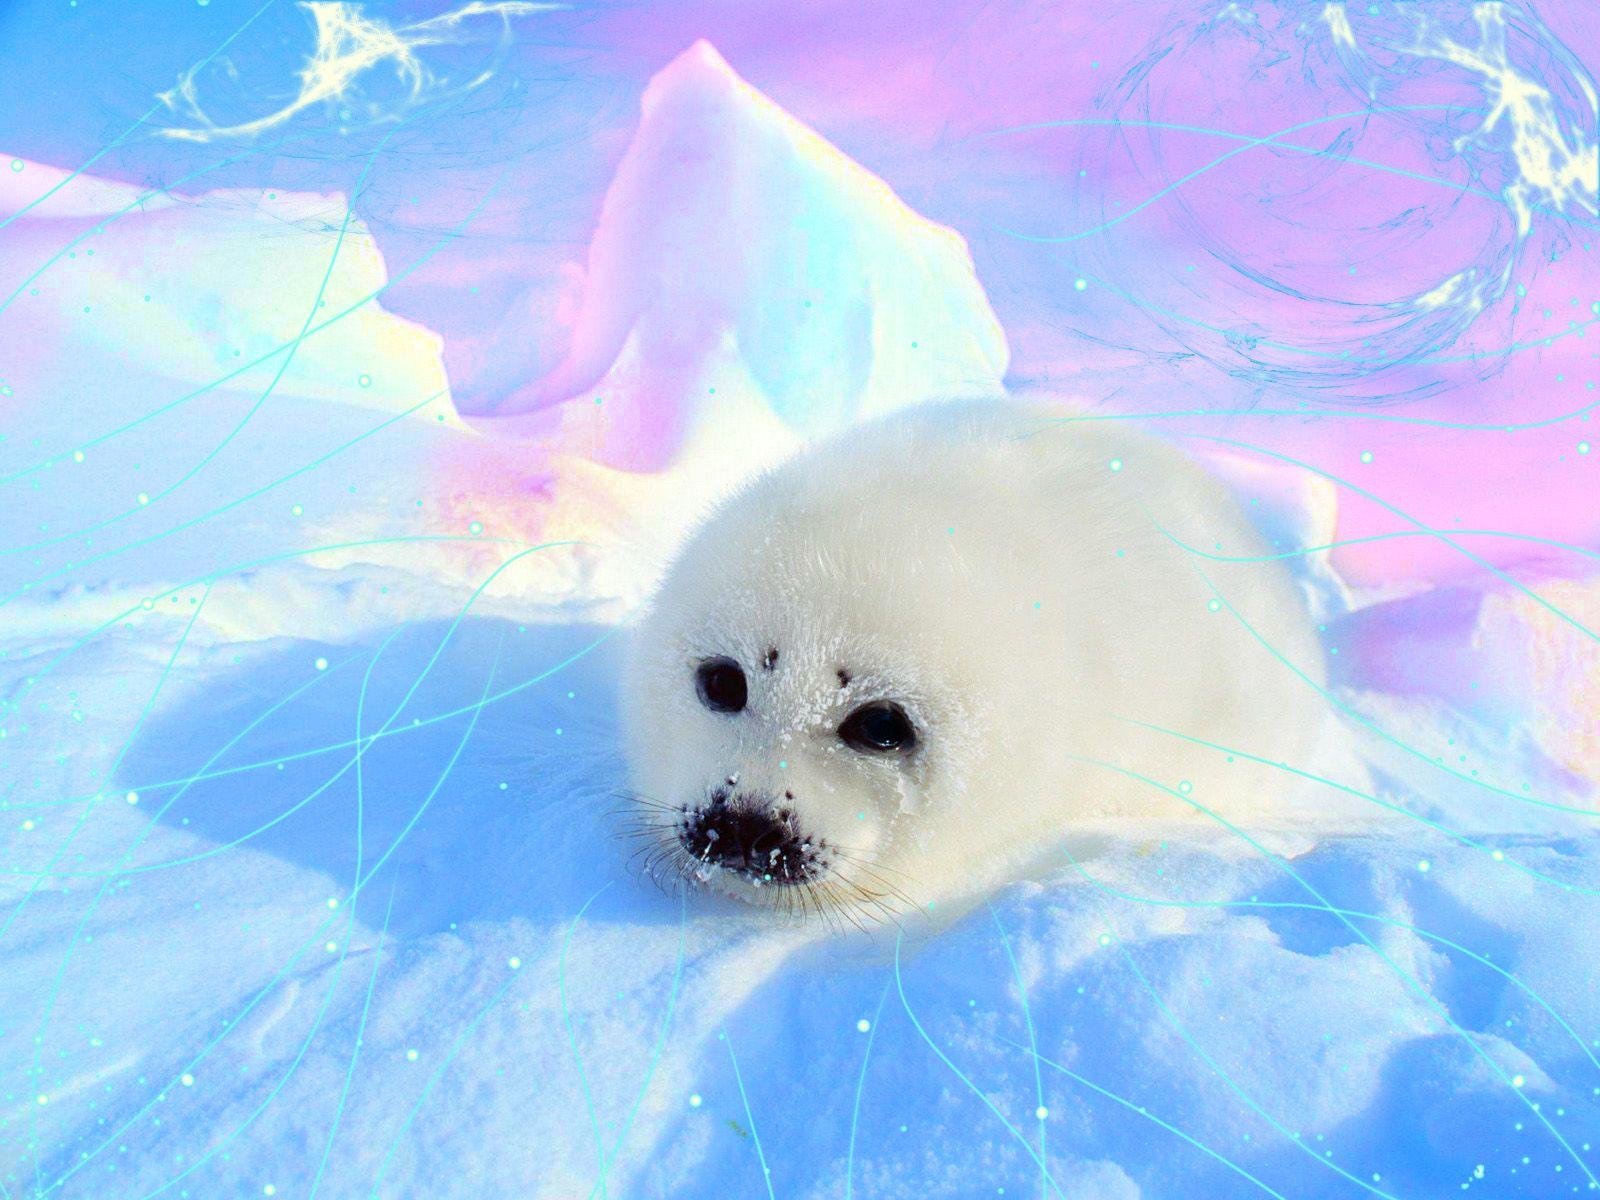 Pics For Cute Baby Seals Wallpaper Cute Seals Baby Seal Seal Pup